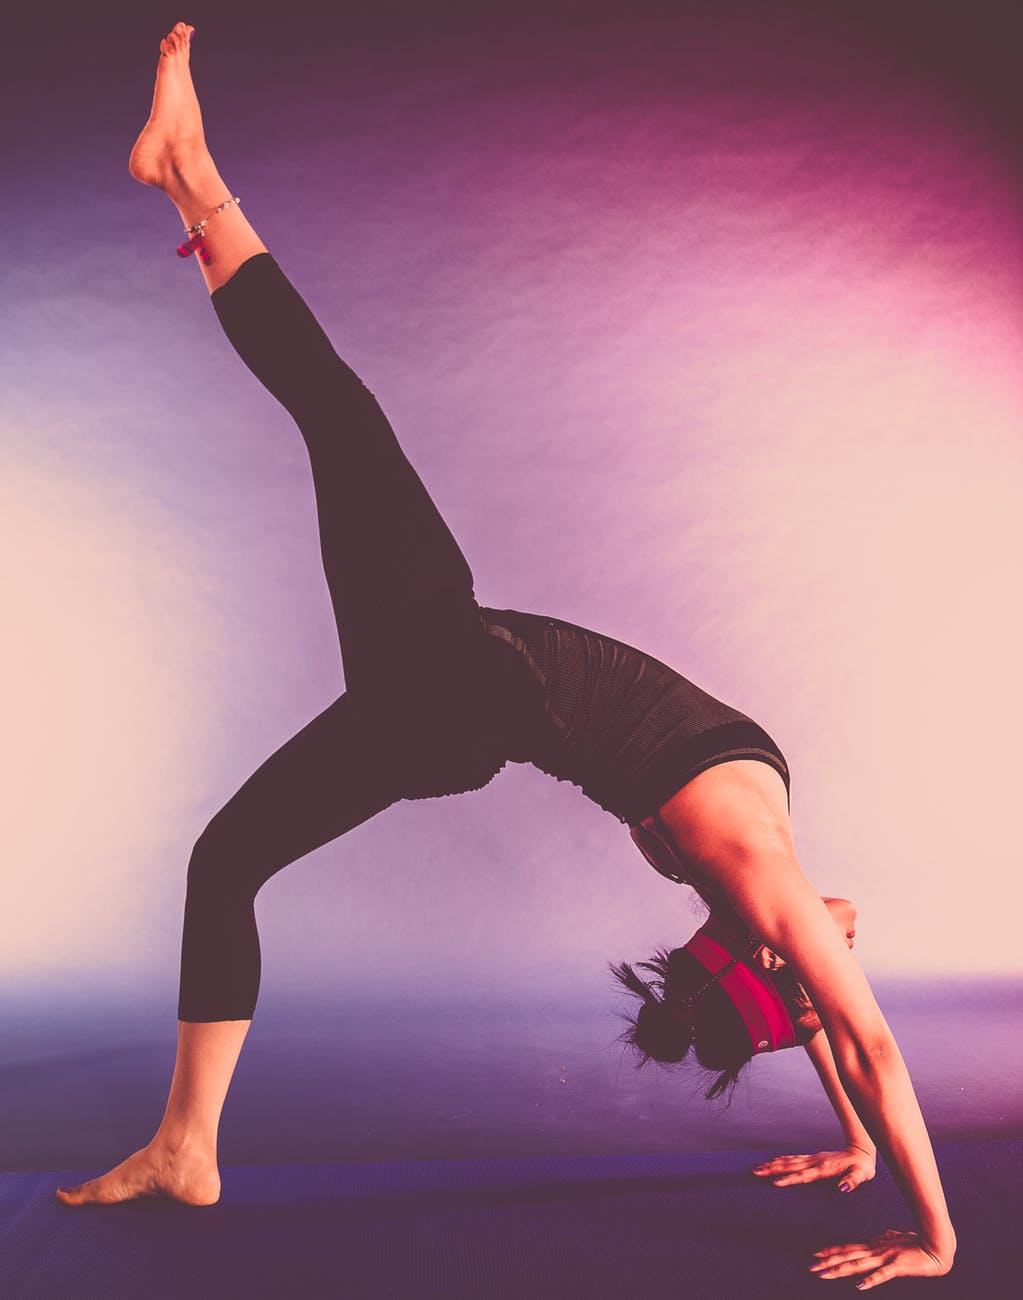 agility balance beautiful girl dancer